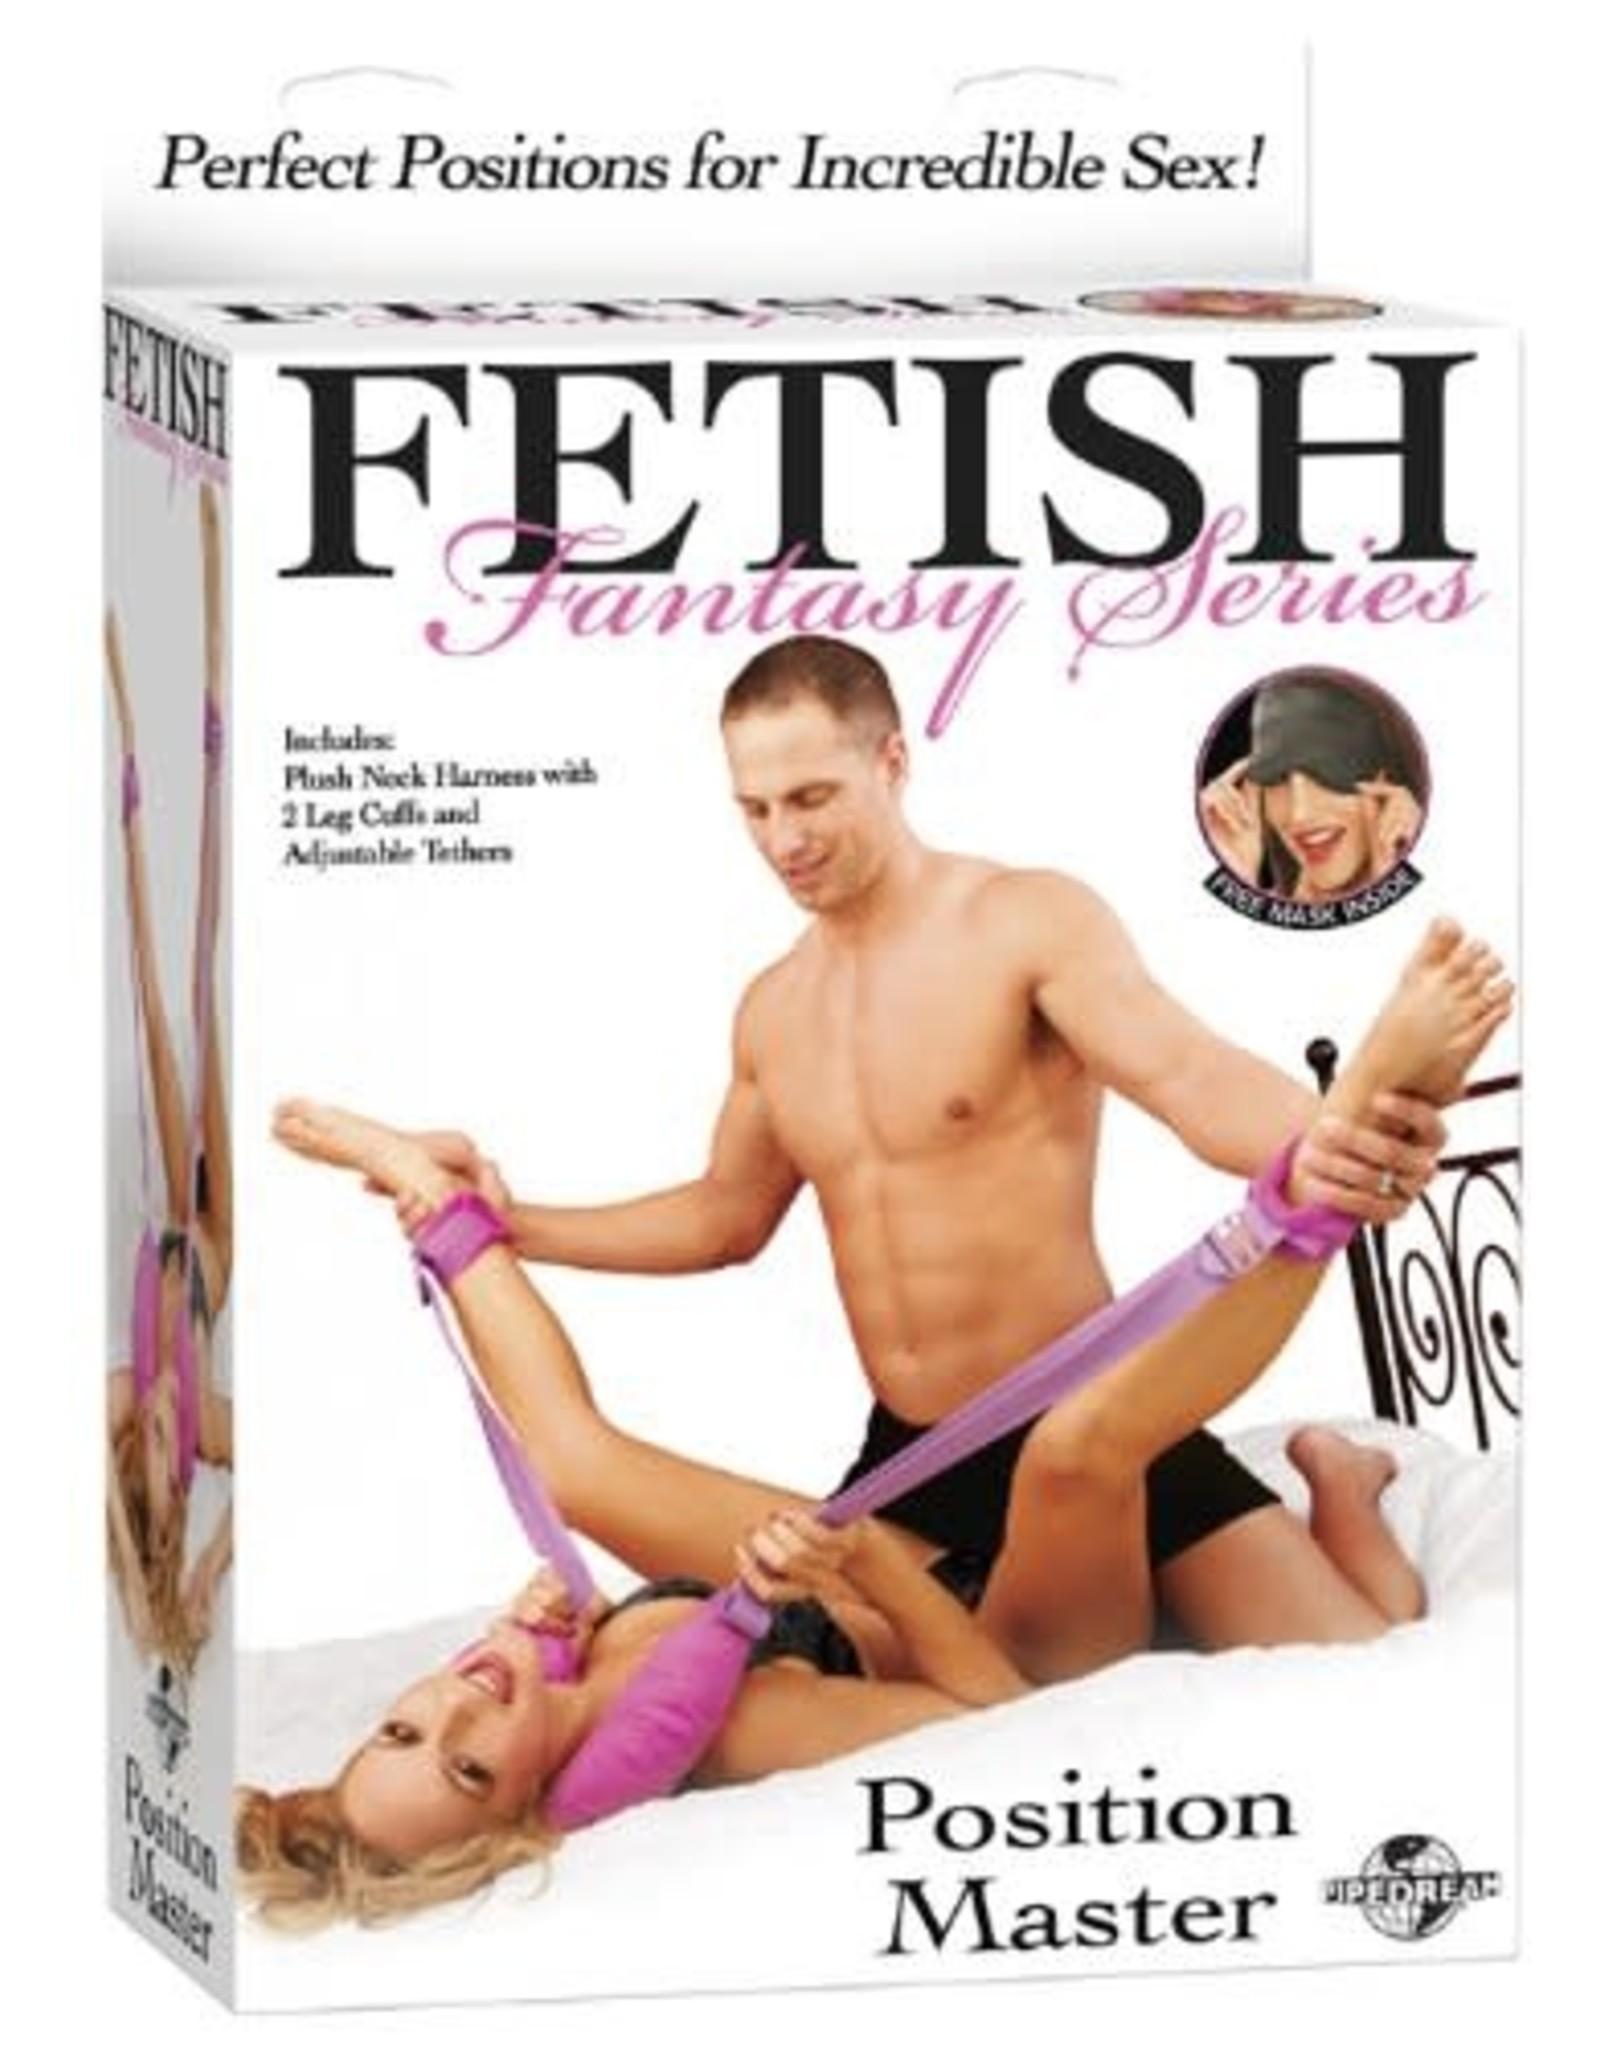 FETISH FANTASY FETISH FANTASY - POSITION MASTER SET